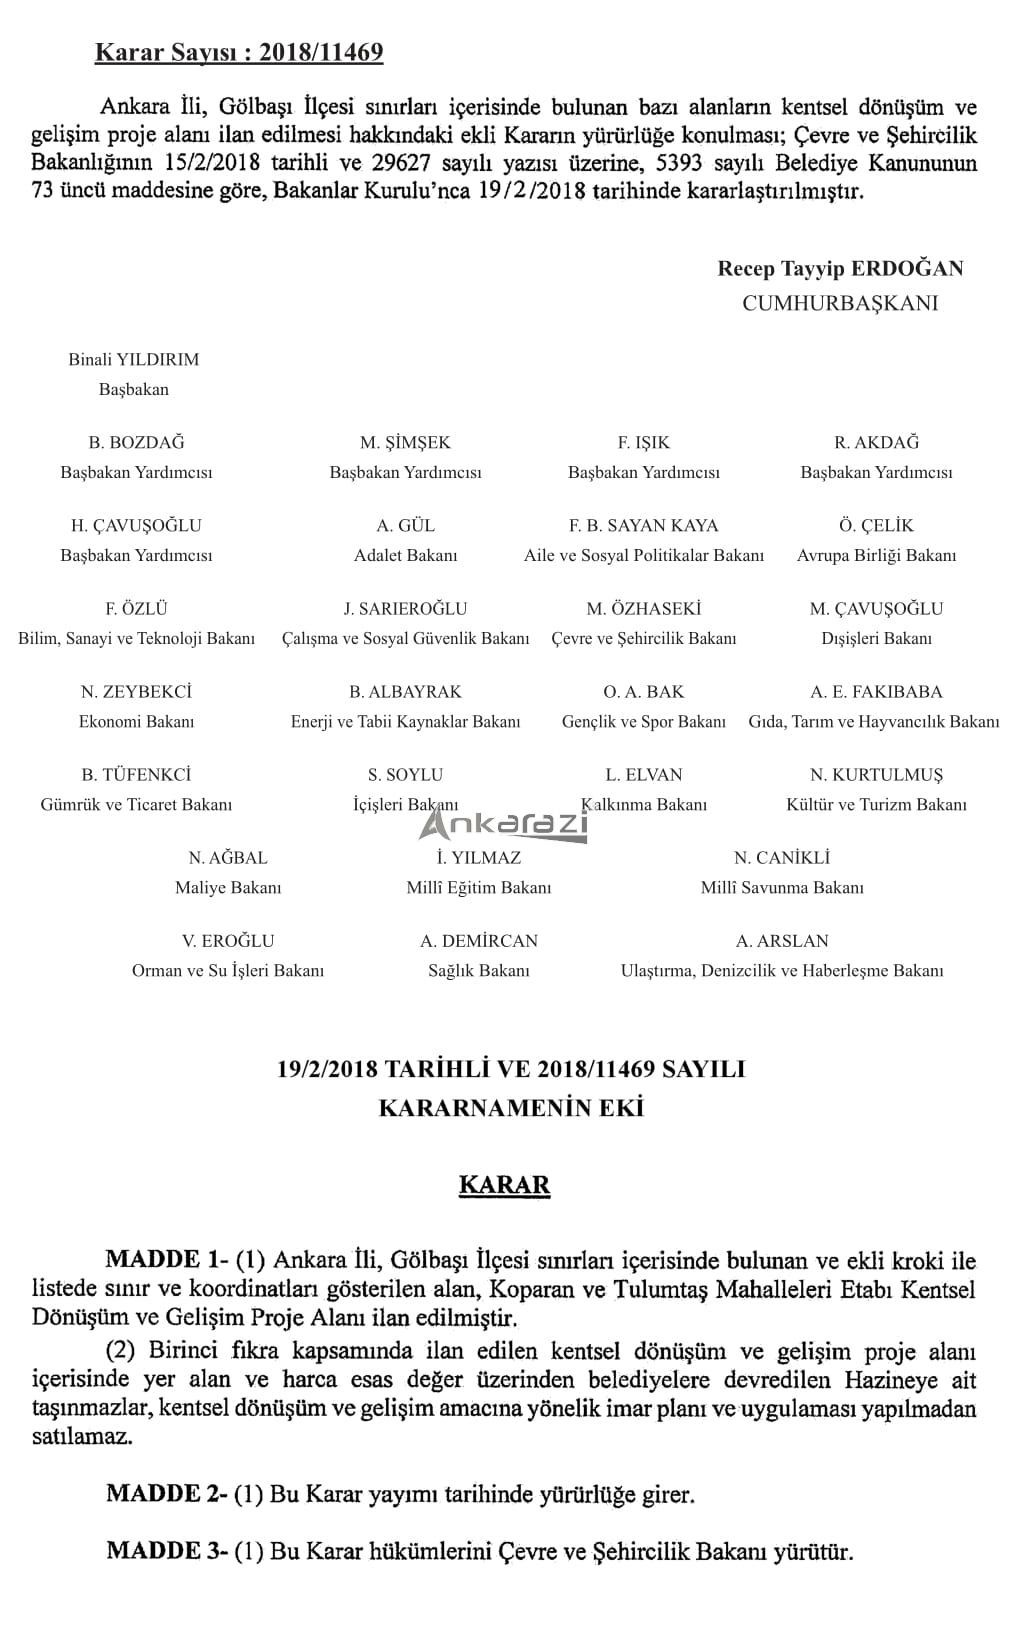 Koparan - Tulumtaş KDGPA Sınırları... 3348